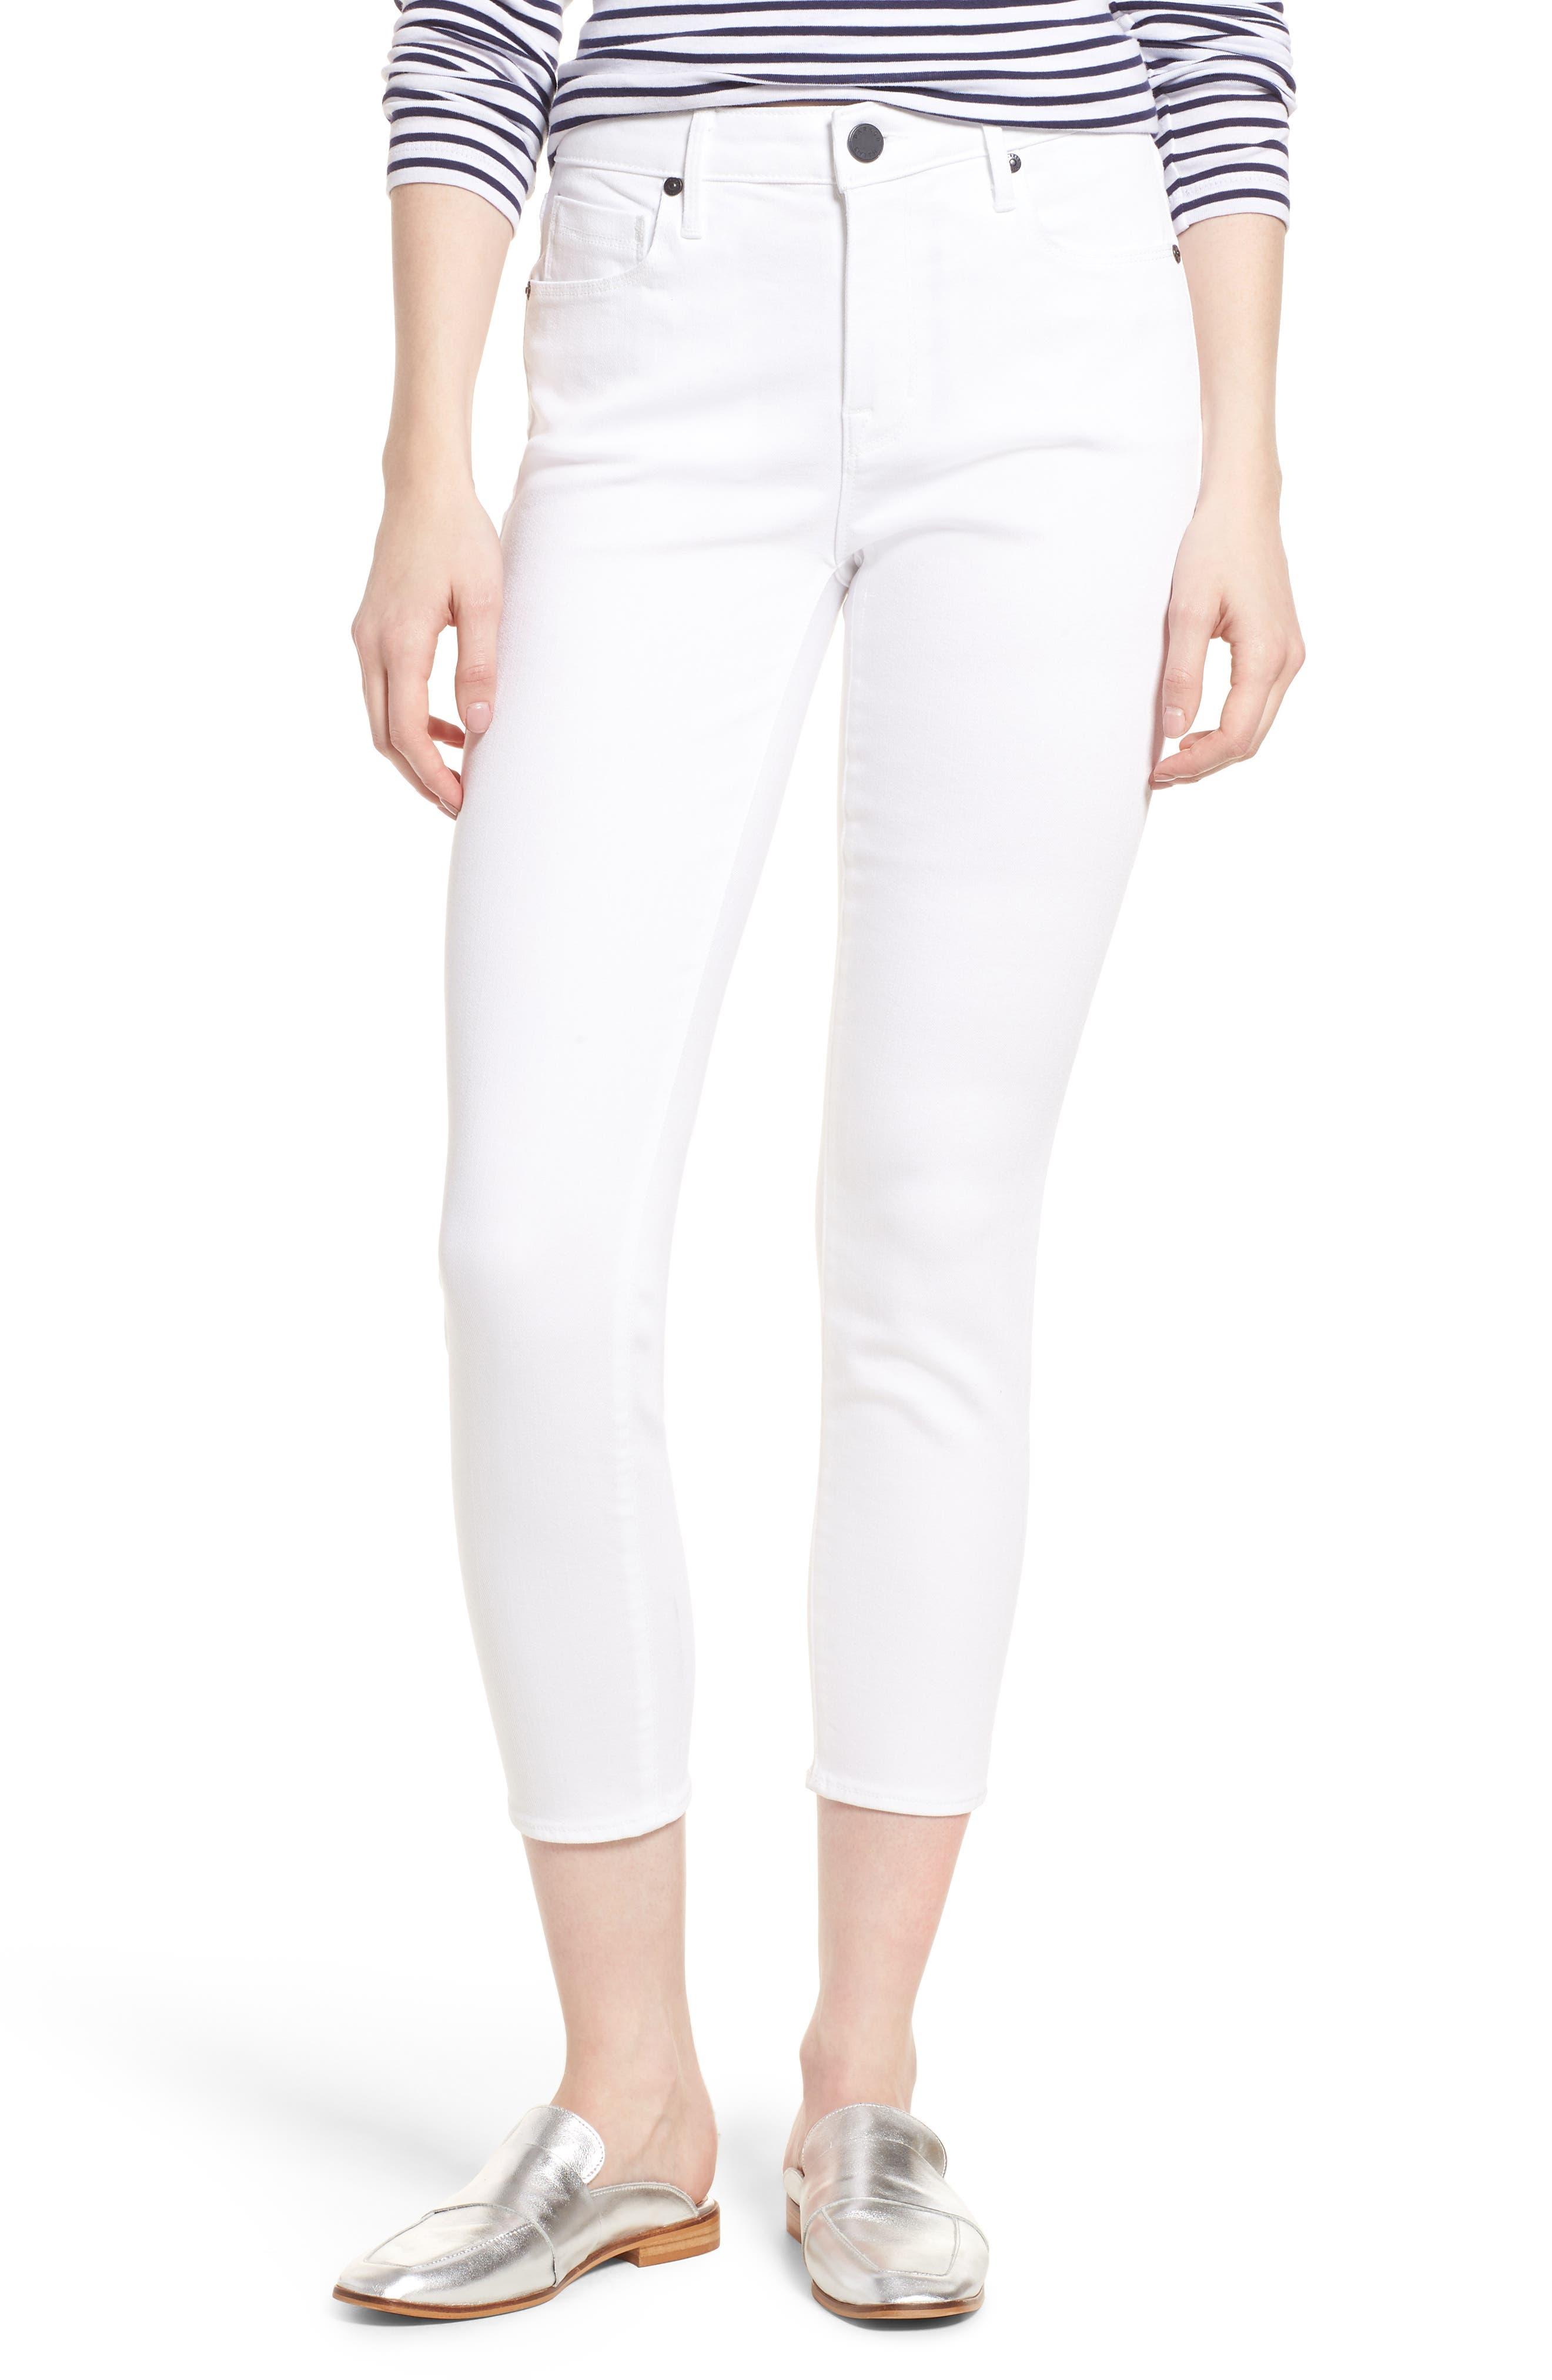 Ava Crop Skinny Jeans,                             Main thumbnail 1, color,                             100